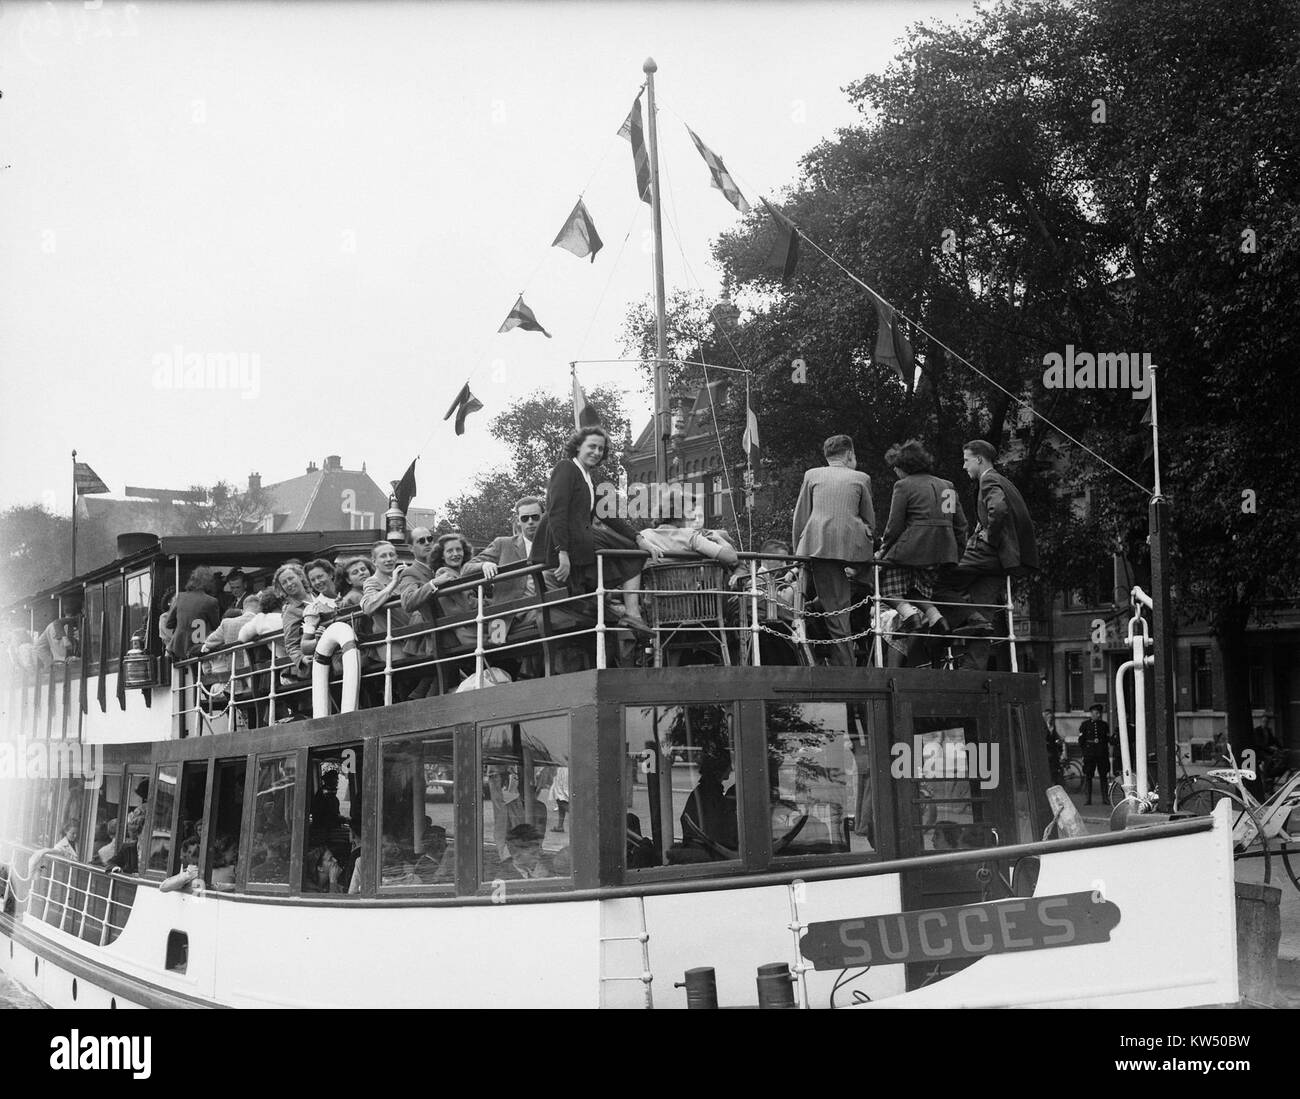 Boottocht Amsterdamse studenten (Lustrum), Bestanddeelnr 902 2469 - Stock Image